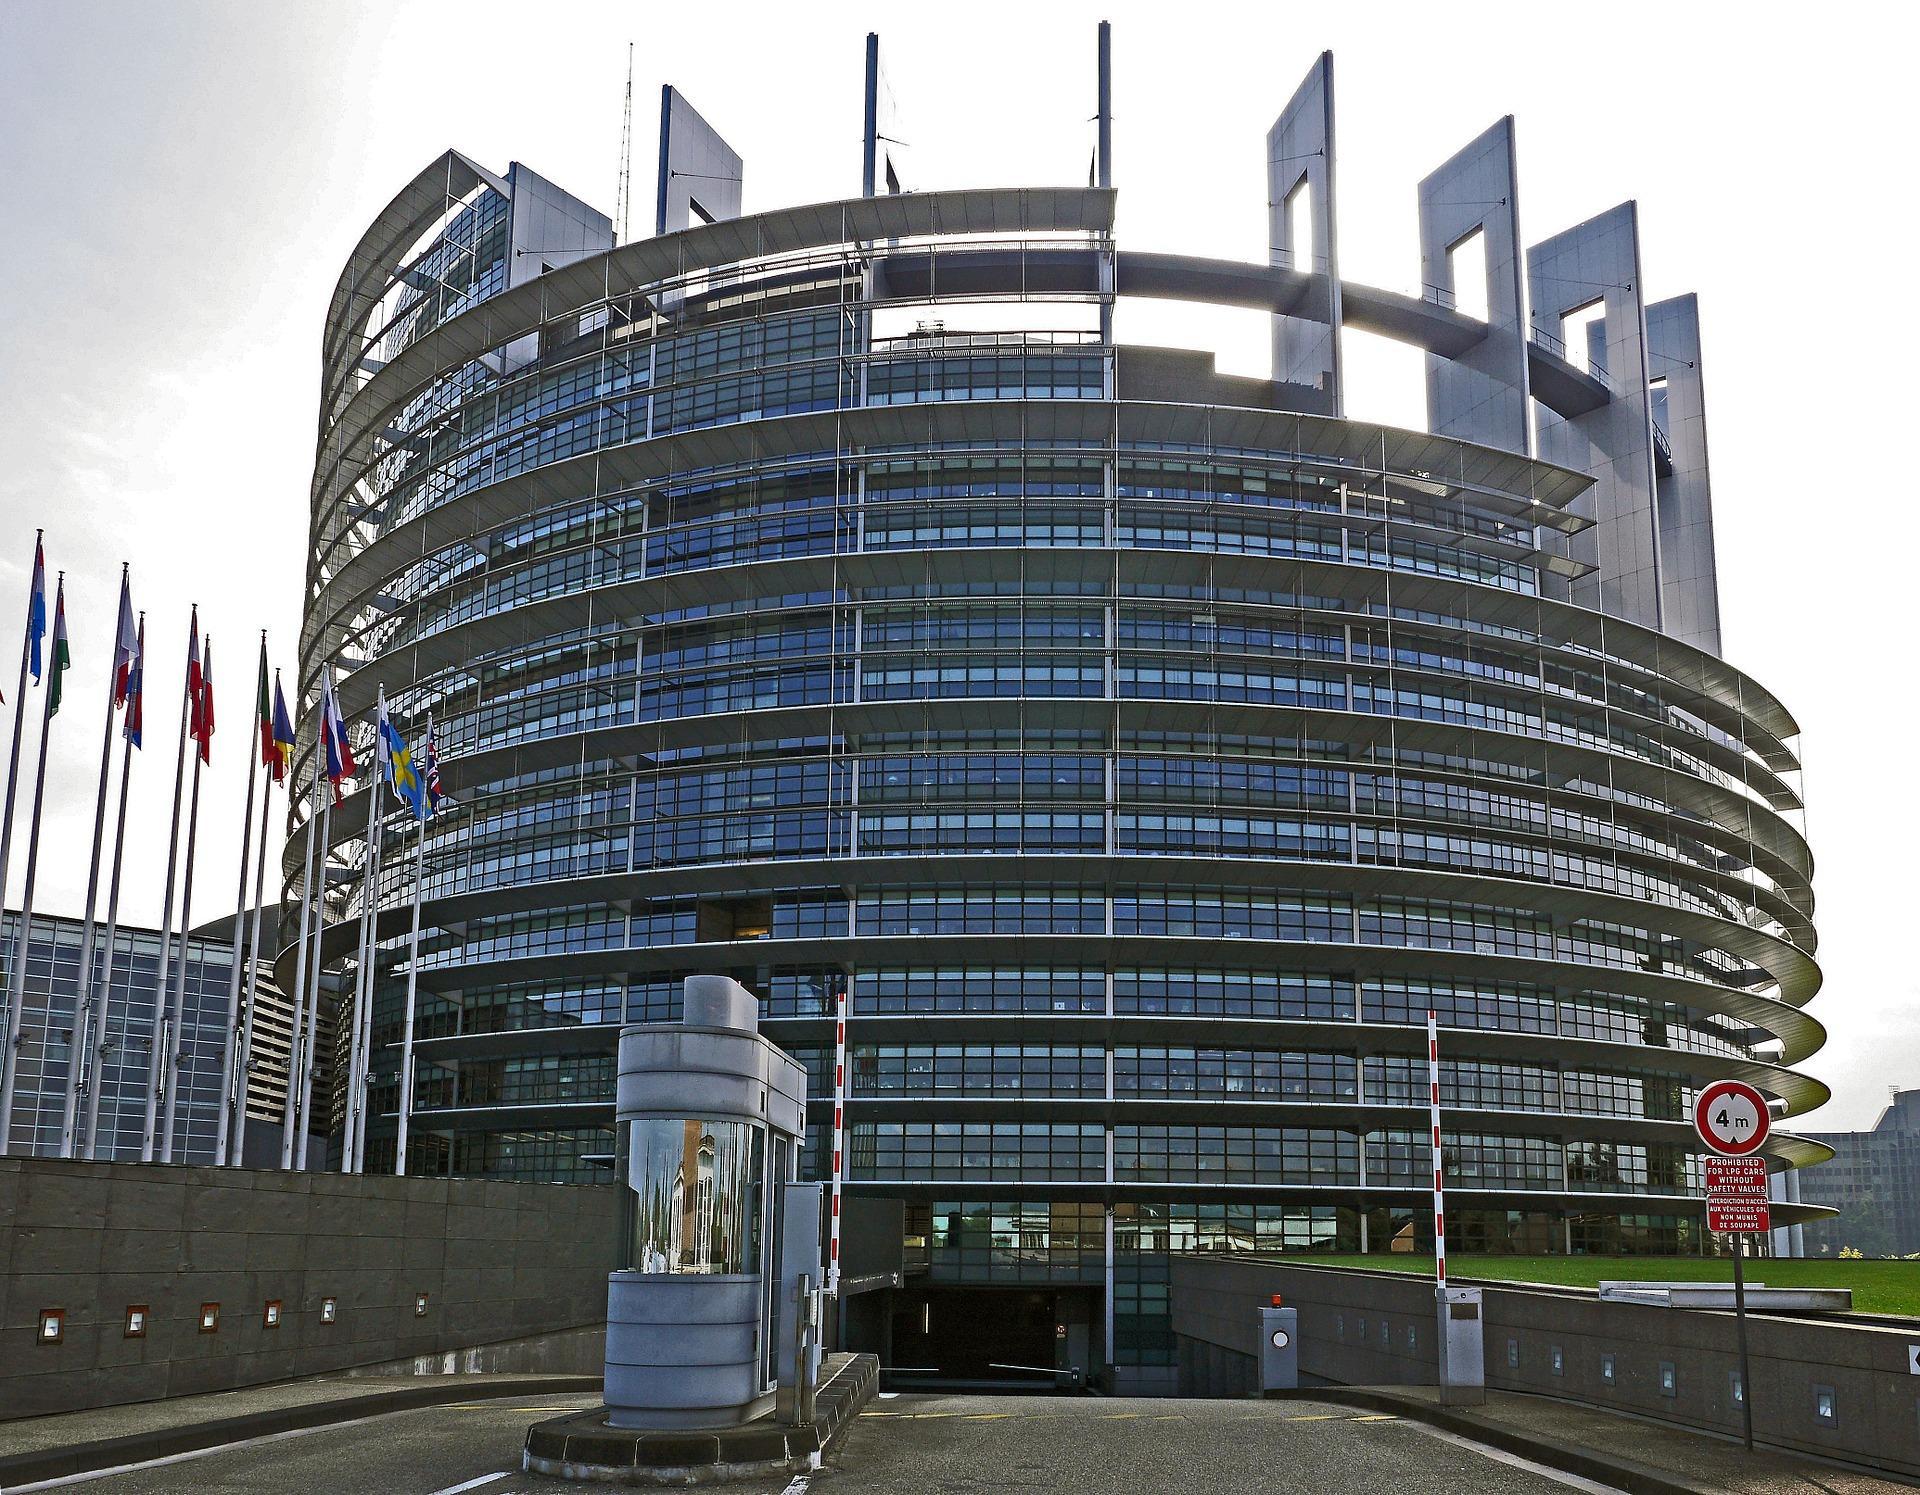 Freiwilliges Europäisches Kulturerbe-Siegel